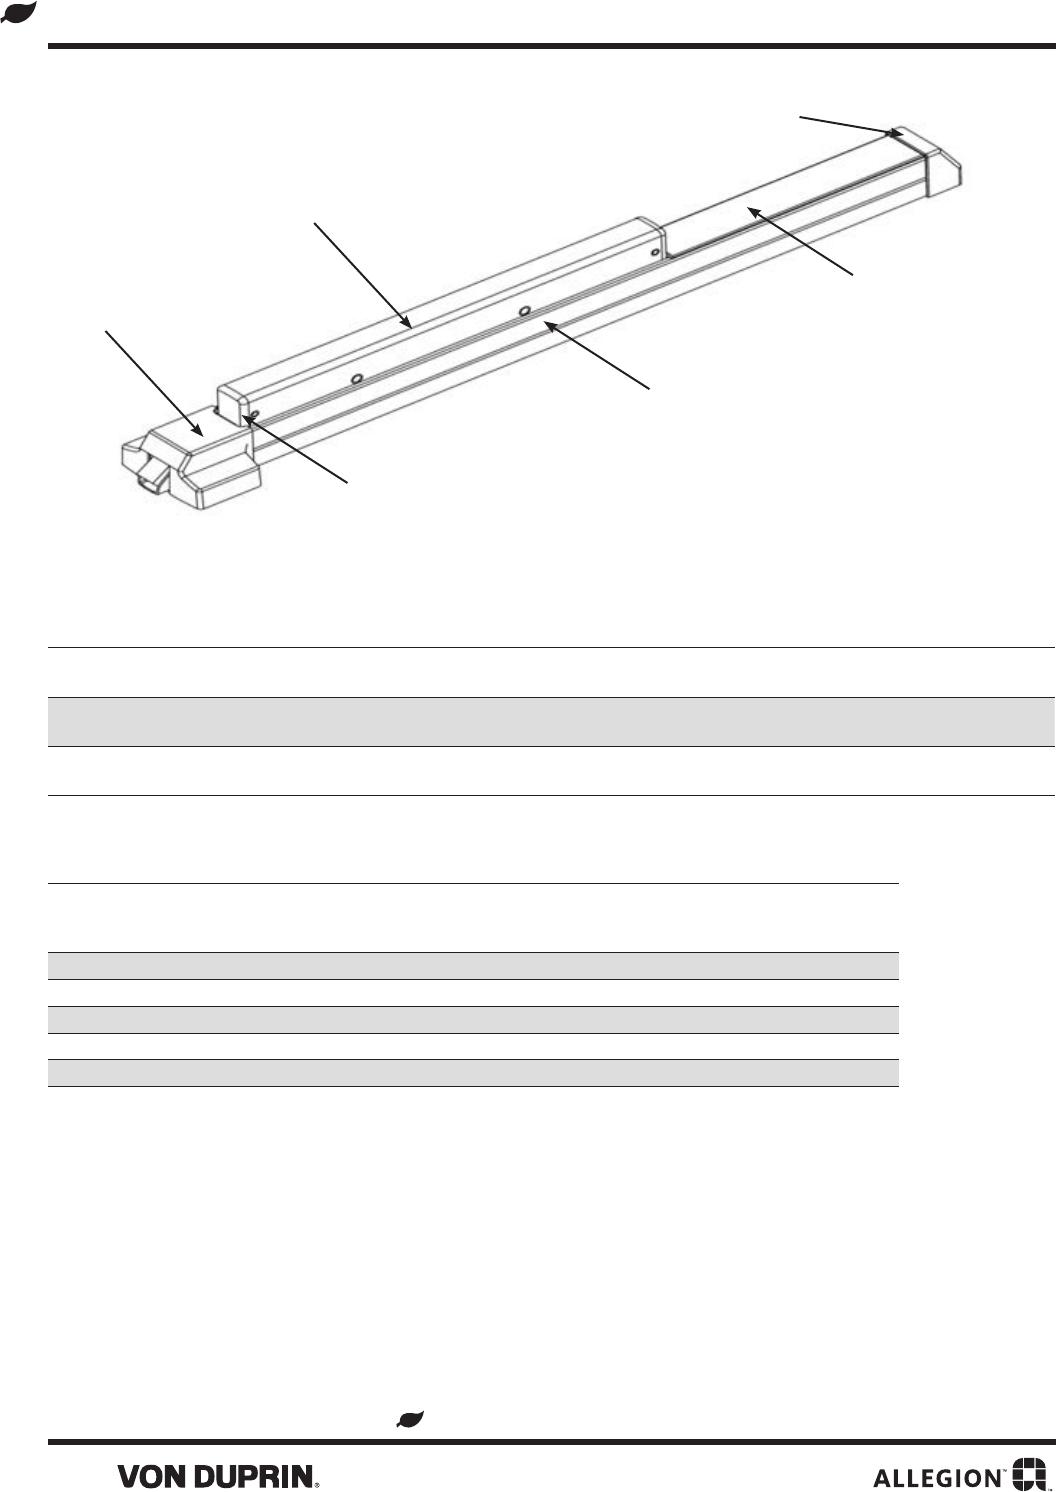 Ps914 Wiring Diagram Library Von Duprin Ps902 Schematic Diagrams